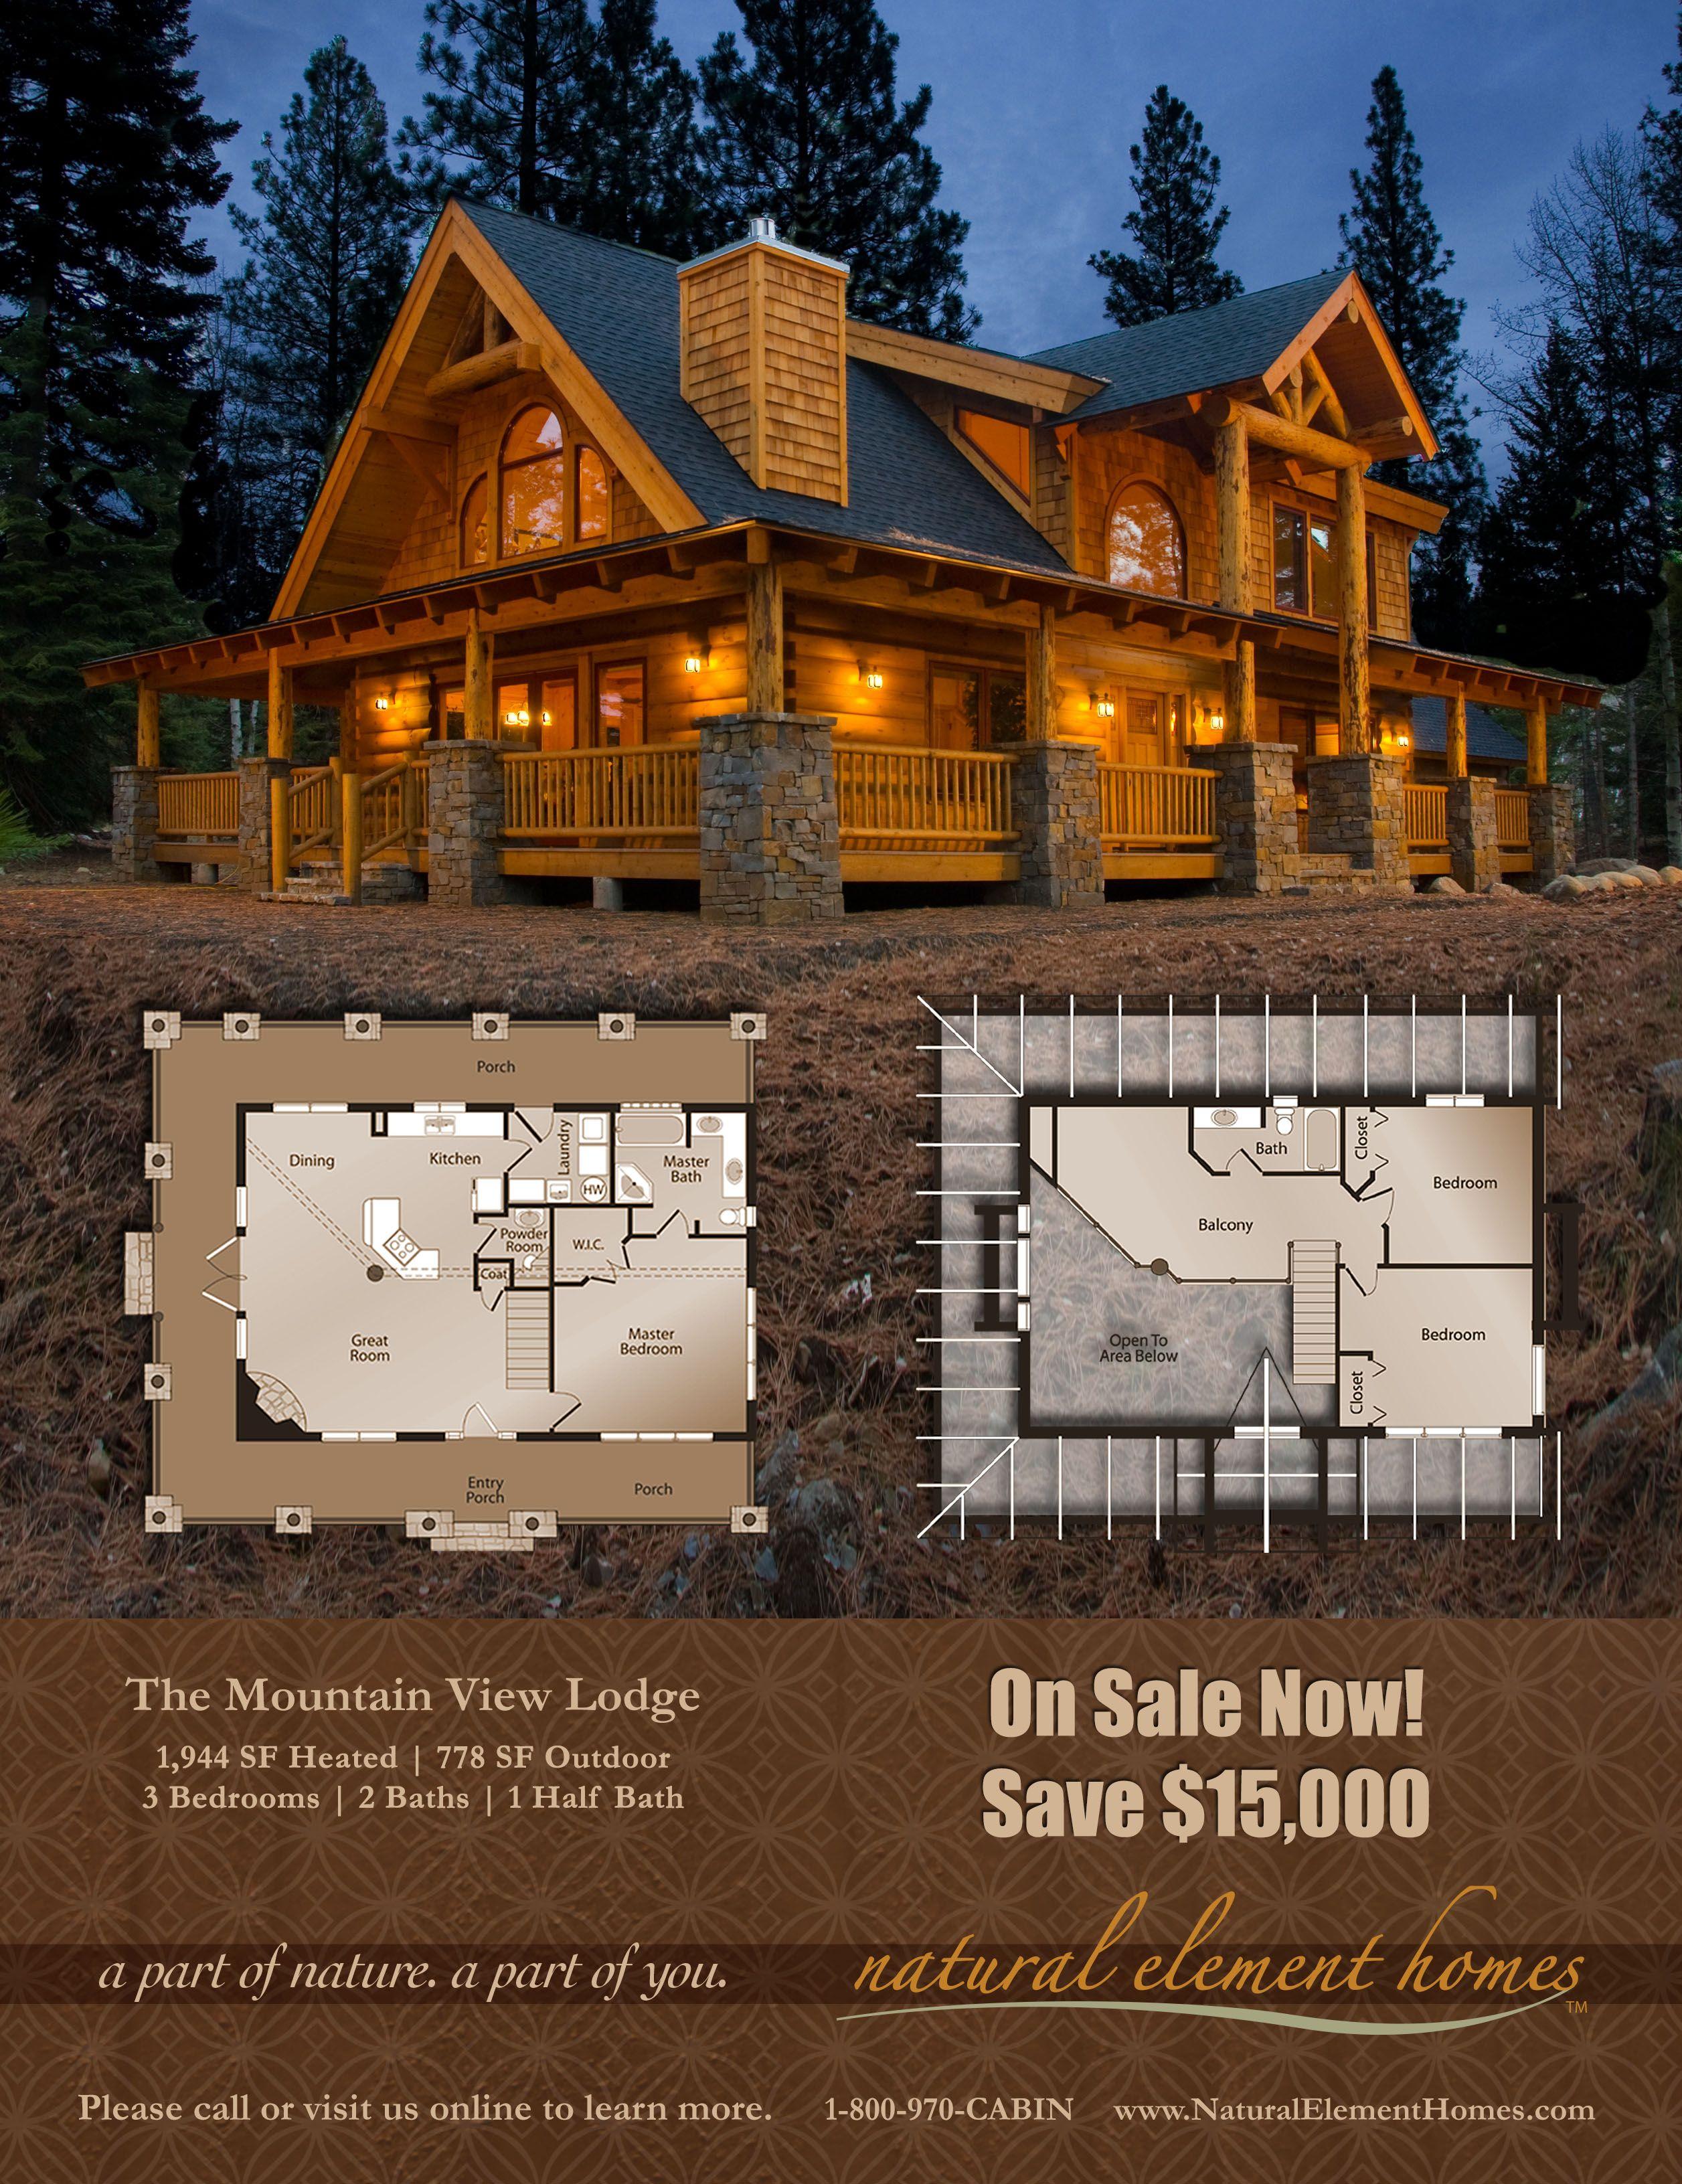 Alaska Dream Home - fa4d960845bf82f118cb916eb5c87163_Amazing Alaska Dream Home - fa4d960845bf82f118cb916eb5c87163  You Should Have_825833.jpg